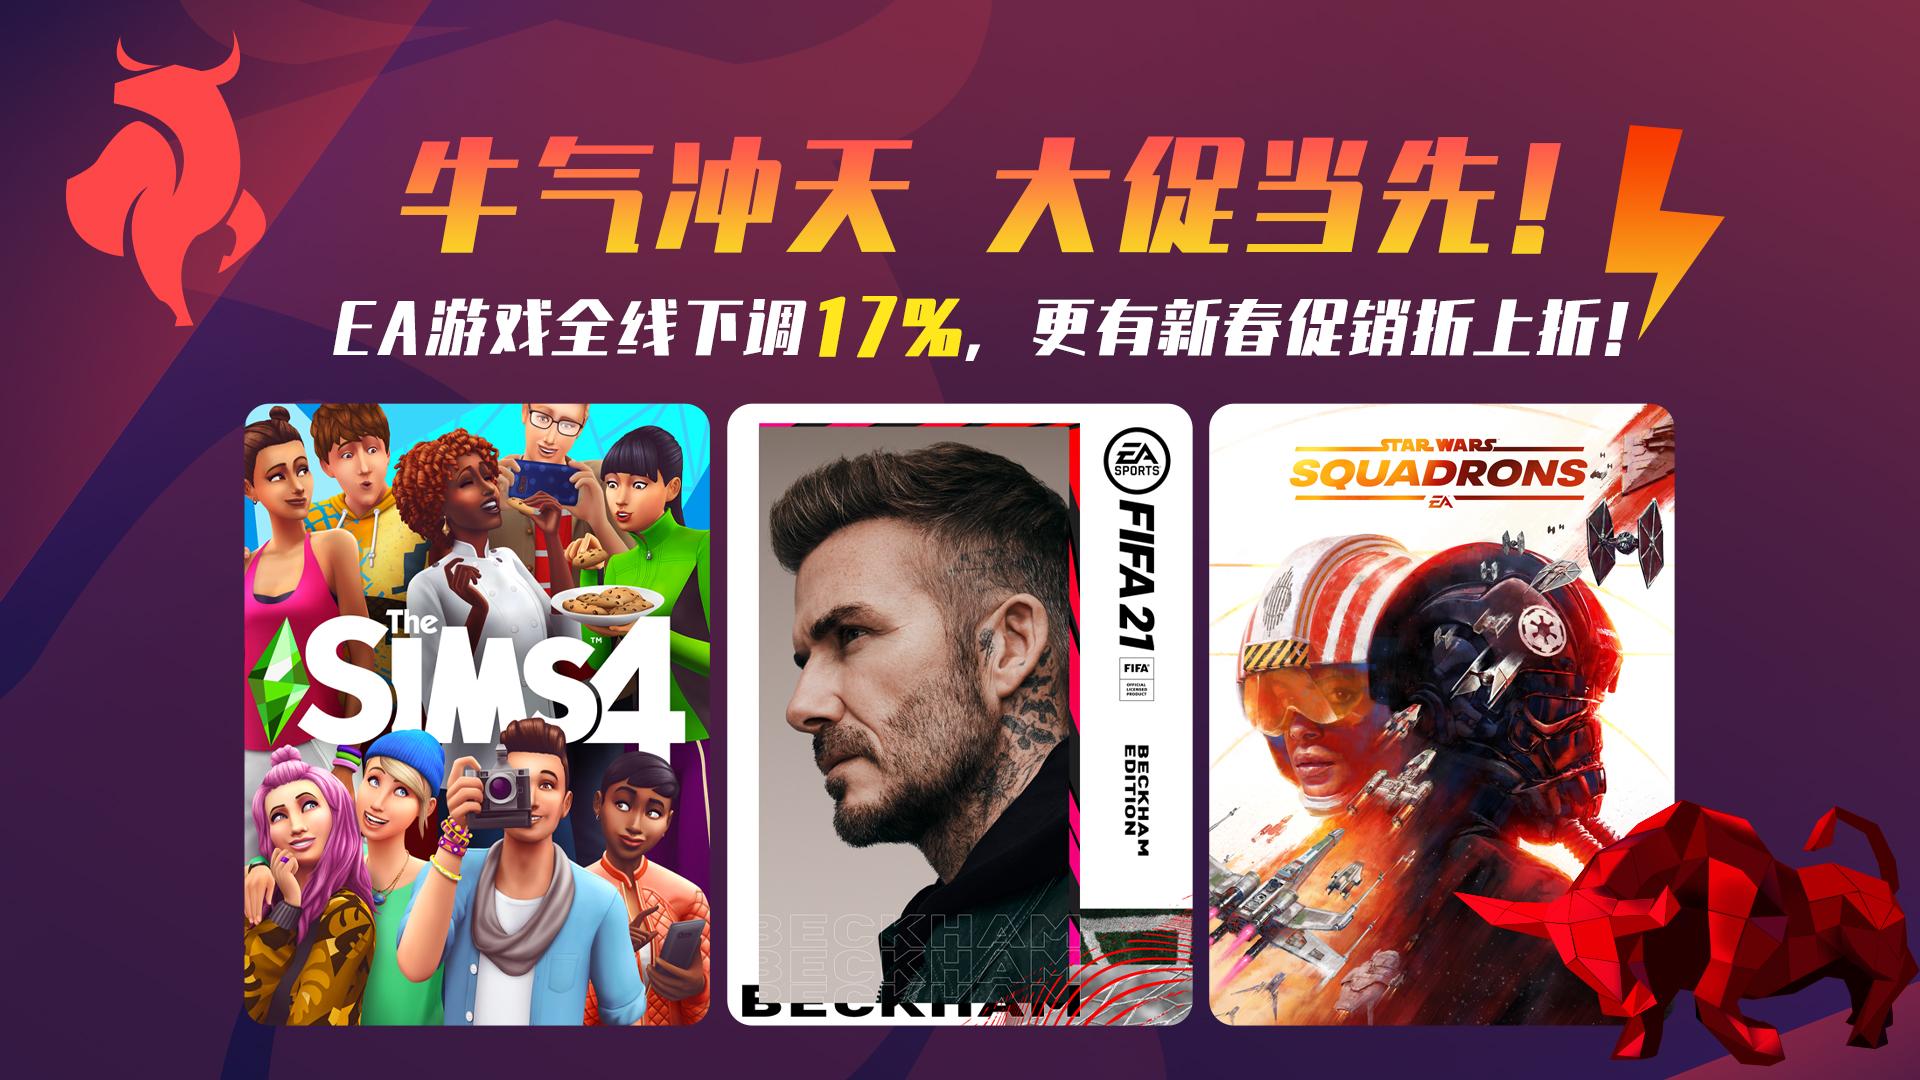 EA开启新春特惠!所有游戏价格永久下调!